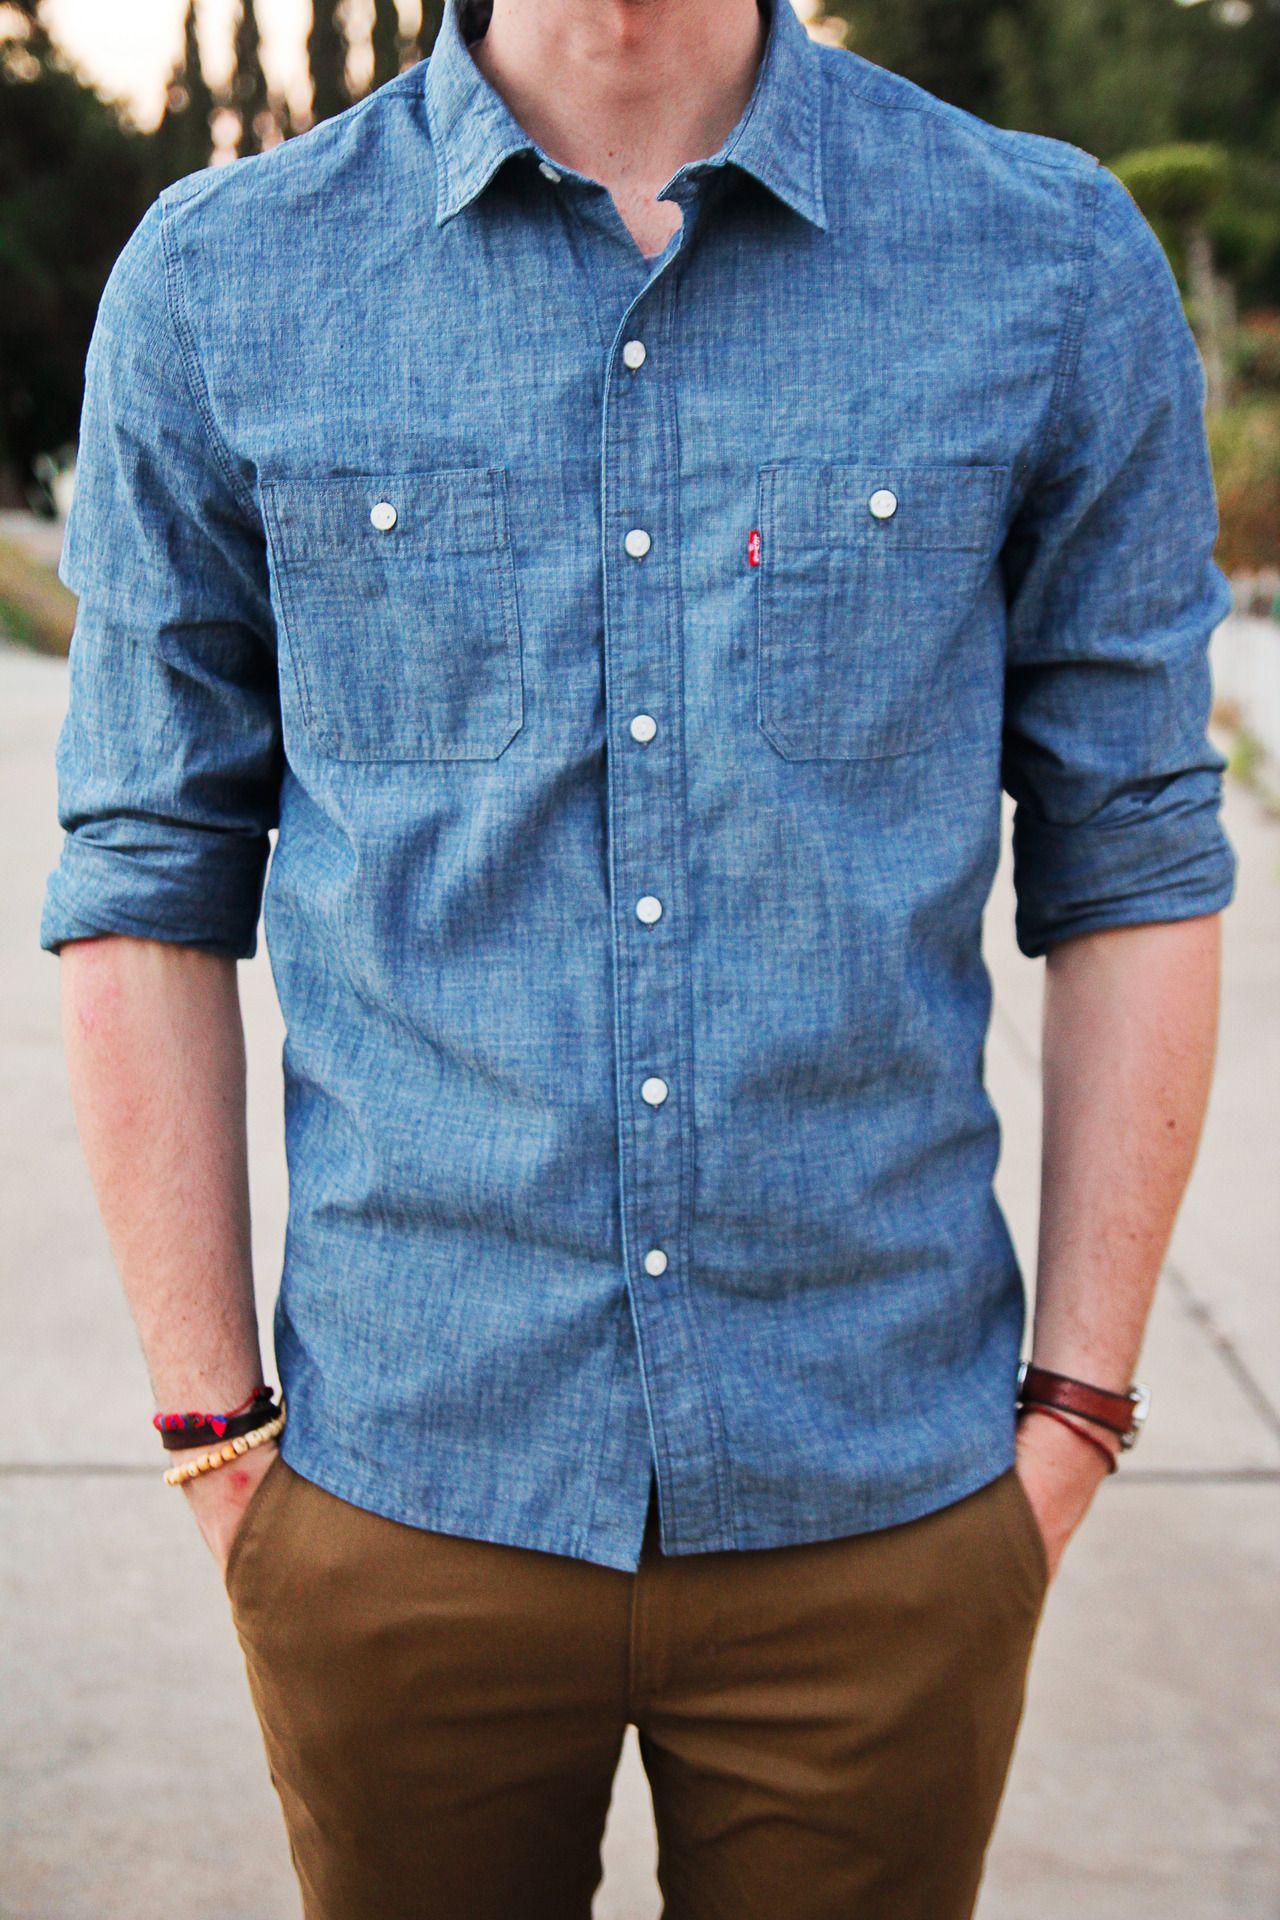 3bf910eb41 edwardshair  10 01 - Levi s shirt and commuter pants ...